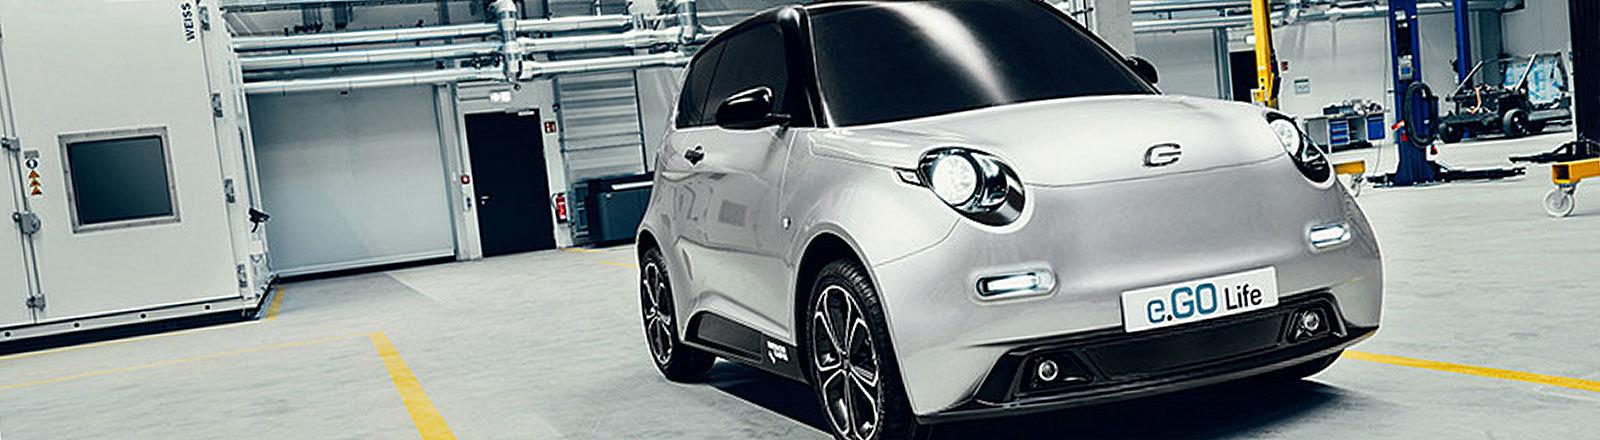 Das Elektroauto e.GO Life der Aachener Firma e.GO Mobile AG